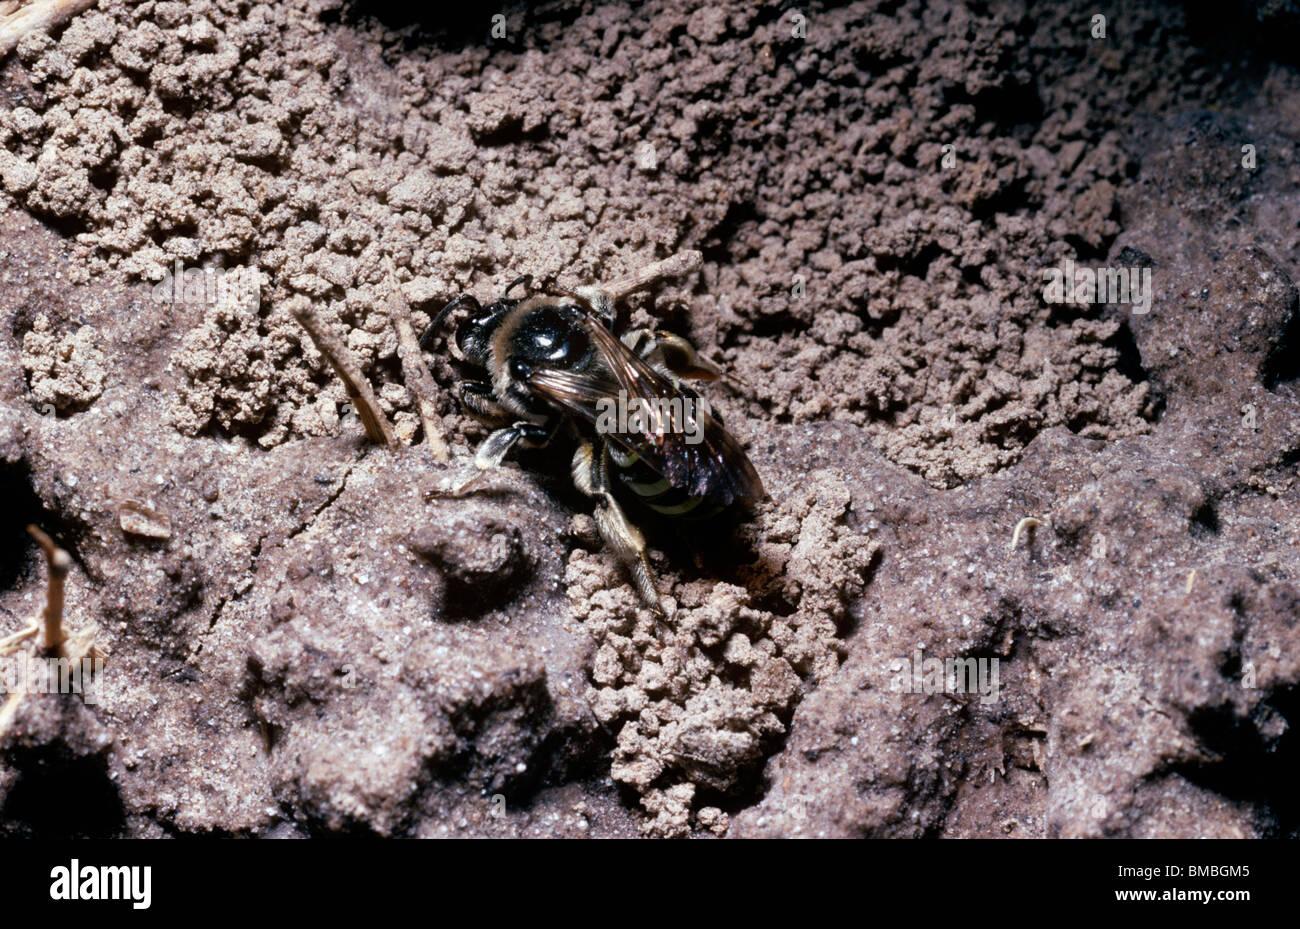 Alkali bee (Nomia melanderi: Halictidae) digging her nest burrow on an alkali flat in desert, Utah, USA - Stock Image